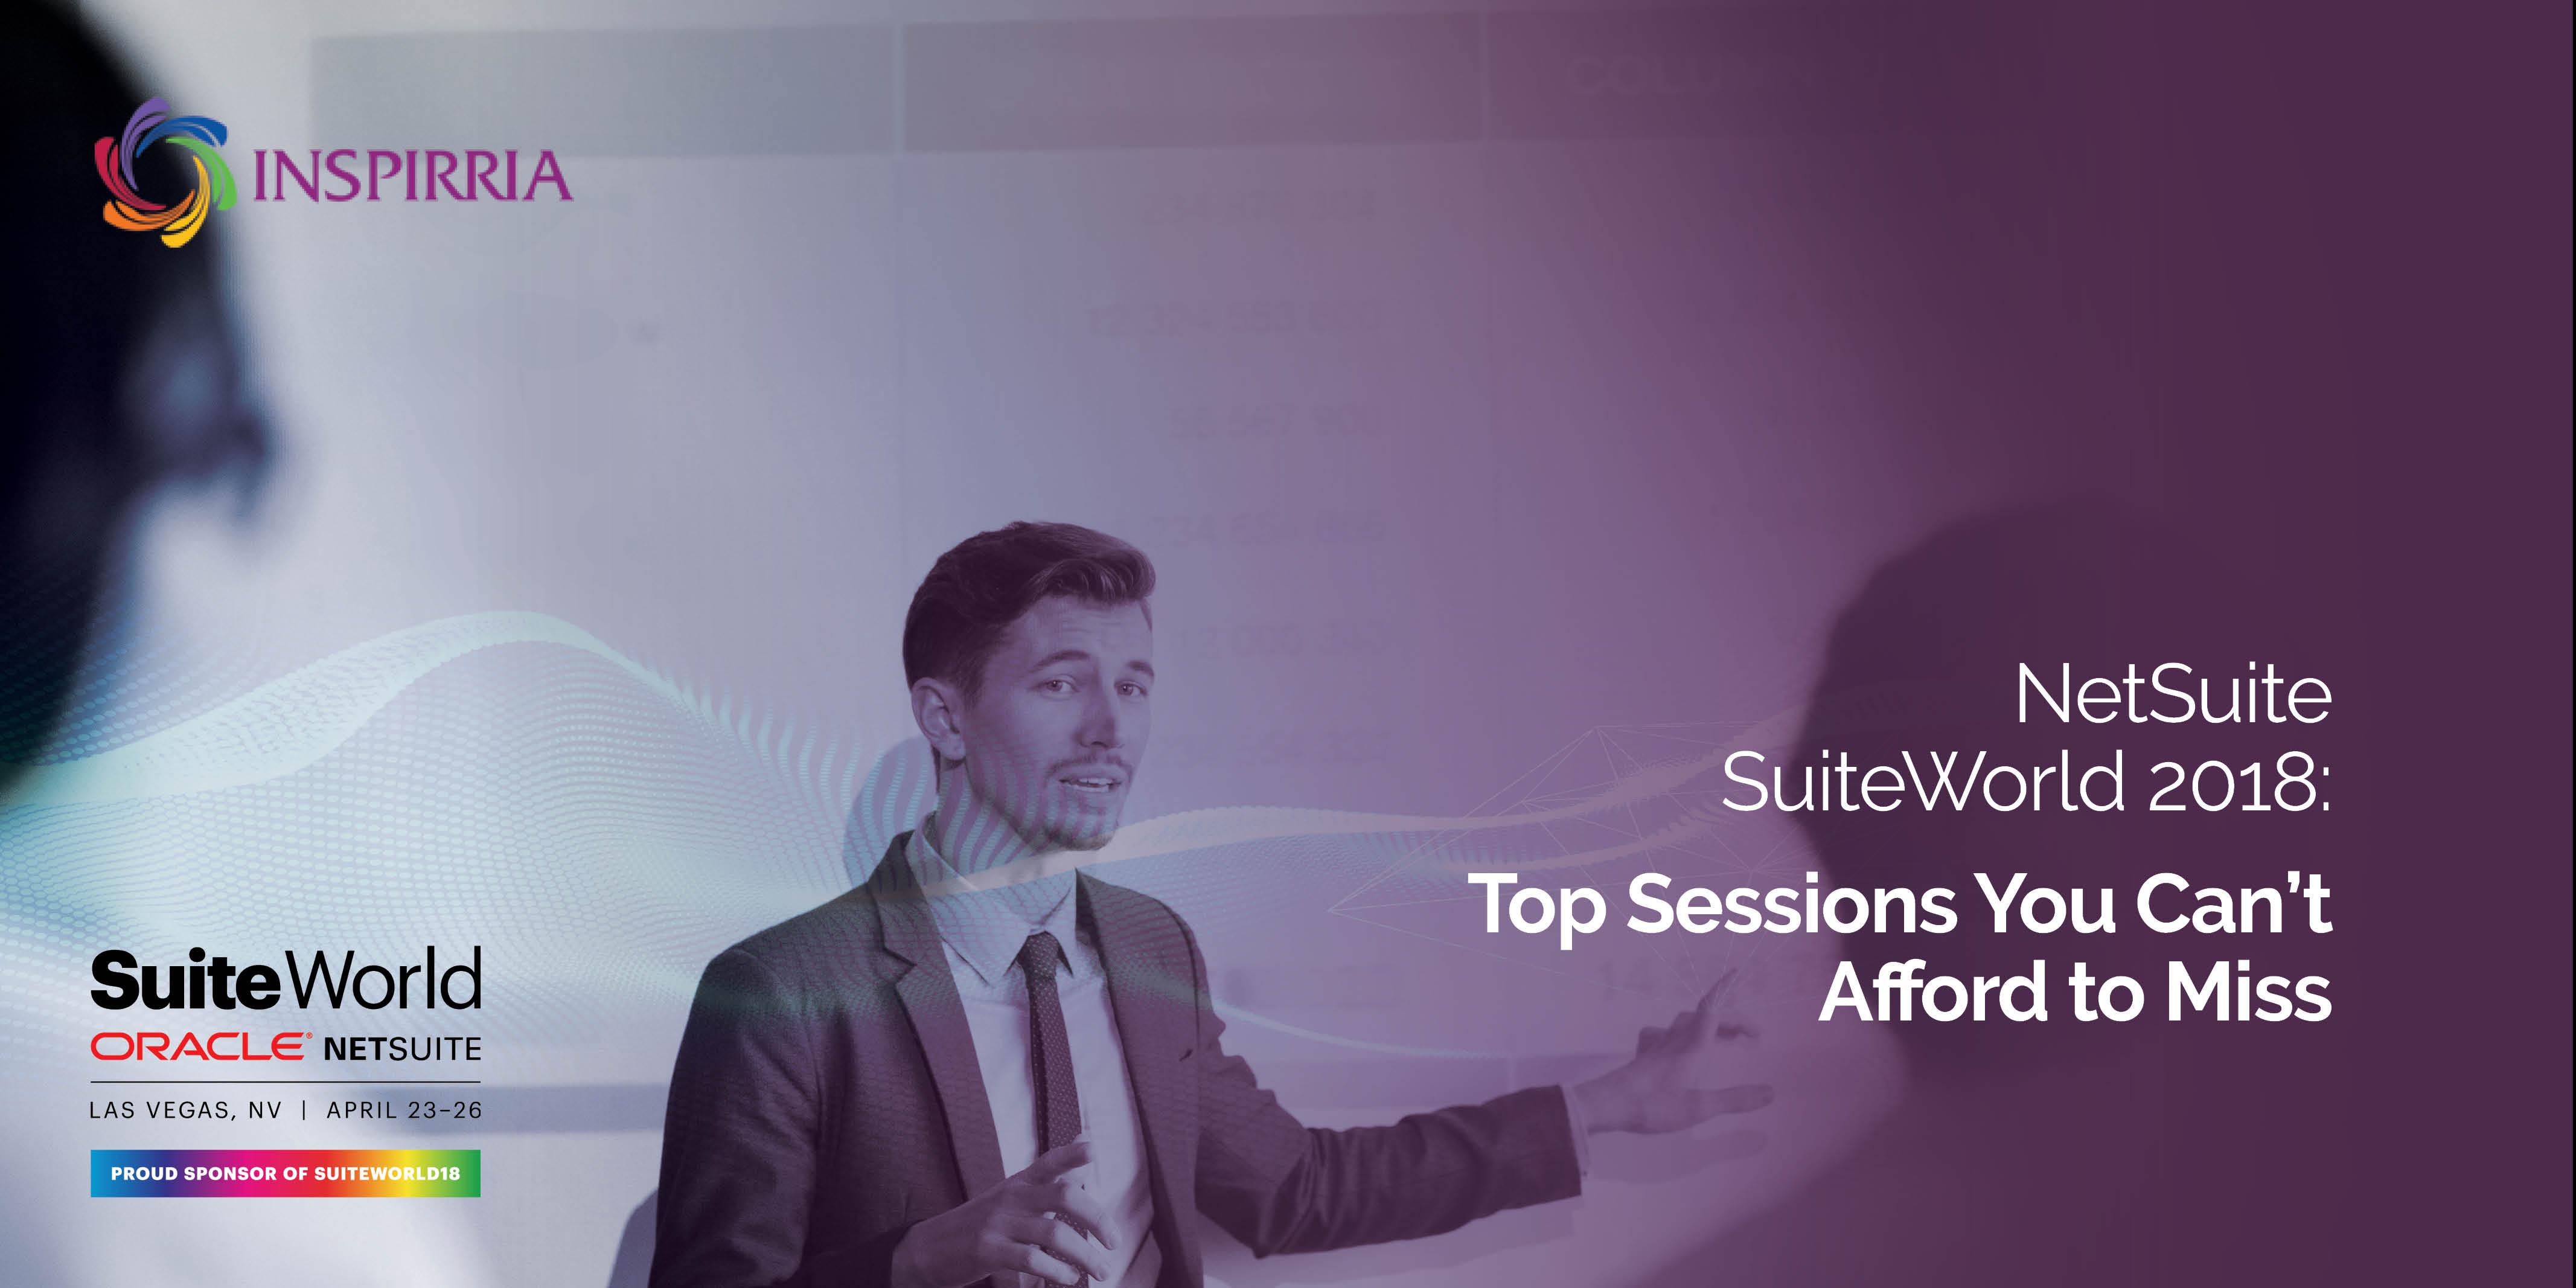 NetSuite SuiteWorld 2018